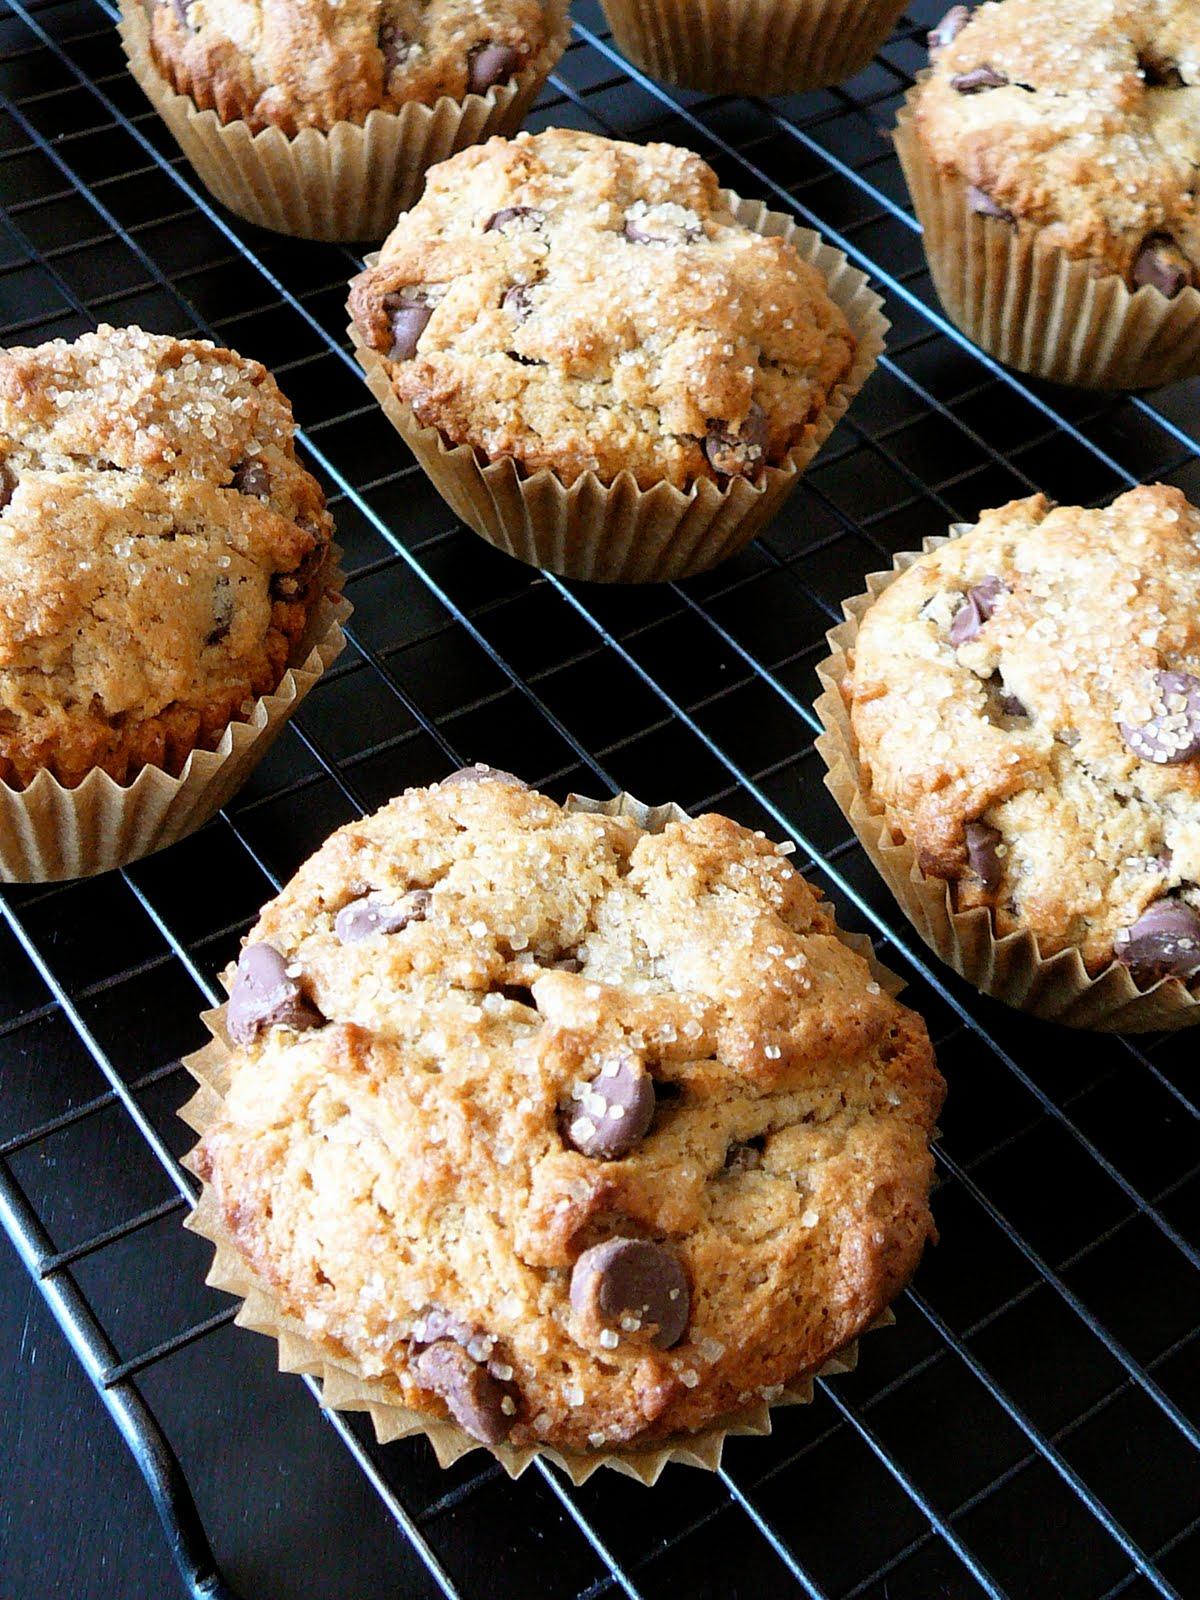 Chocolate Chocolate Chip Banana Muffins With Glaze Recipes ...